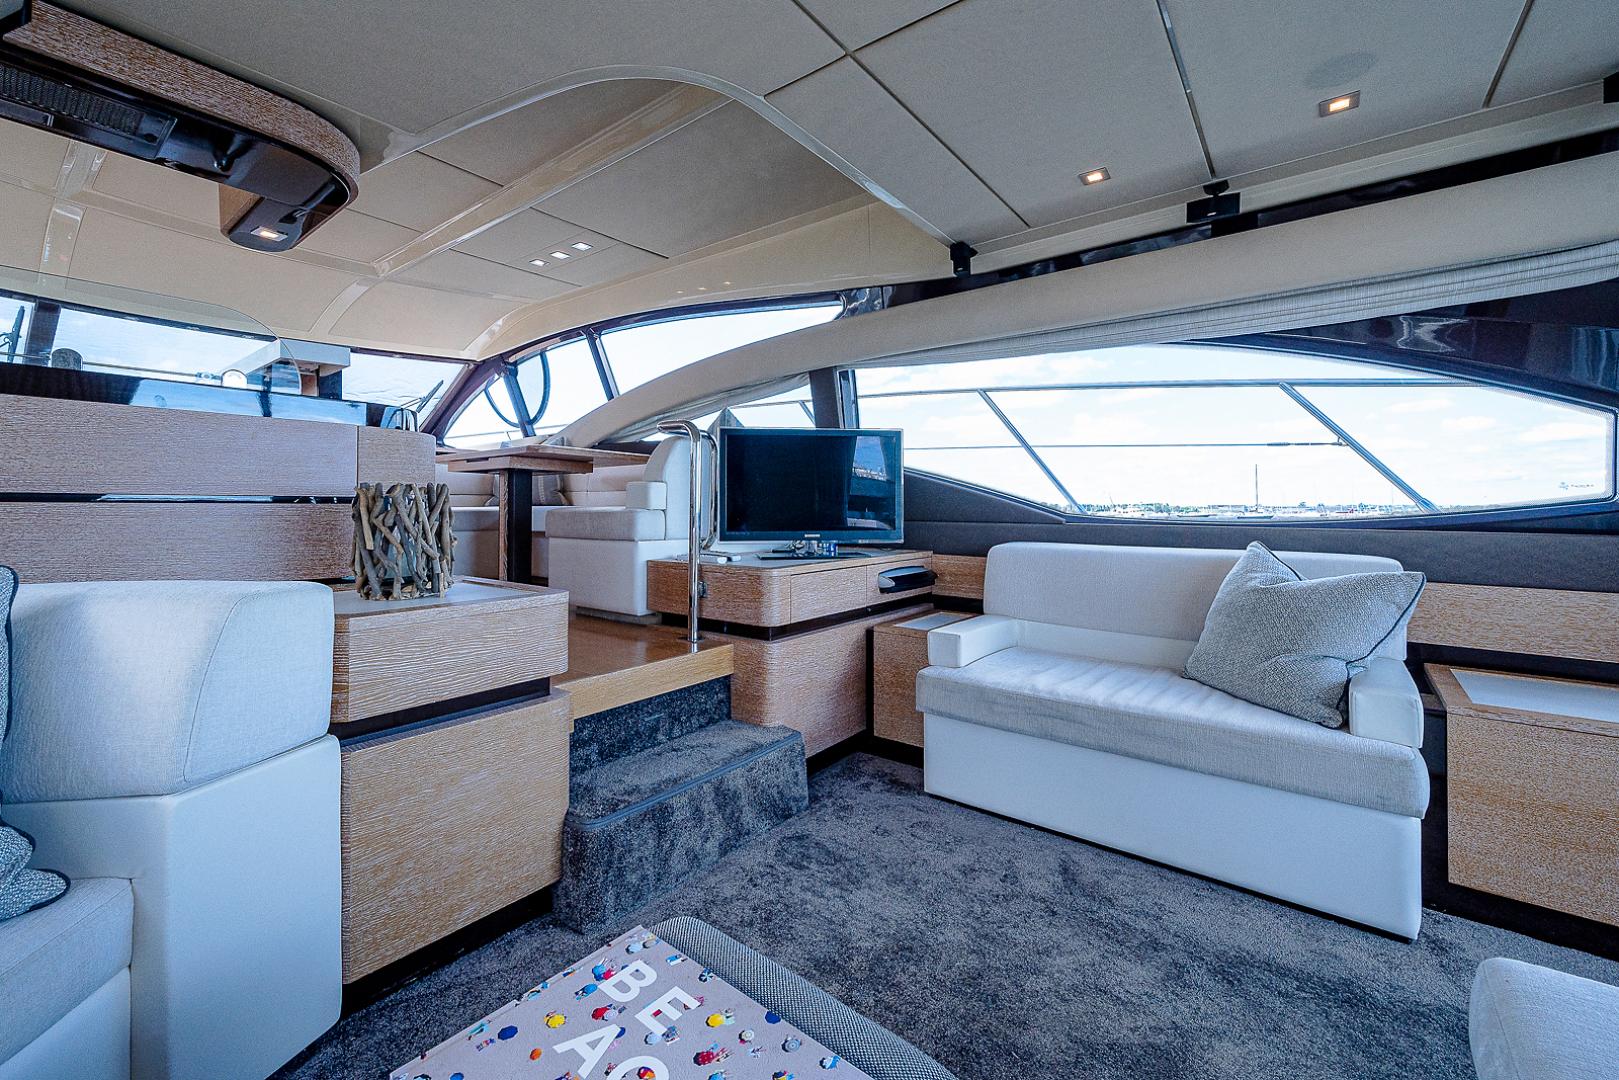 Azimut-58 Fly Motor Yacht 2011-Nova Fort Lauderdale-Florida-United States-58_azimut_nova__salon14-1490475 | Thumbnail